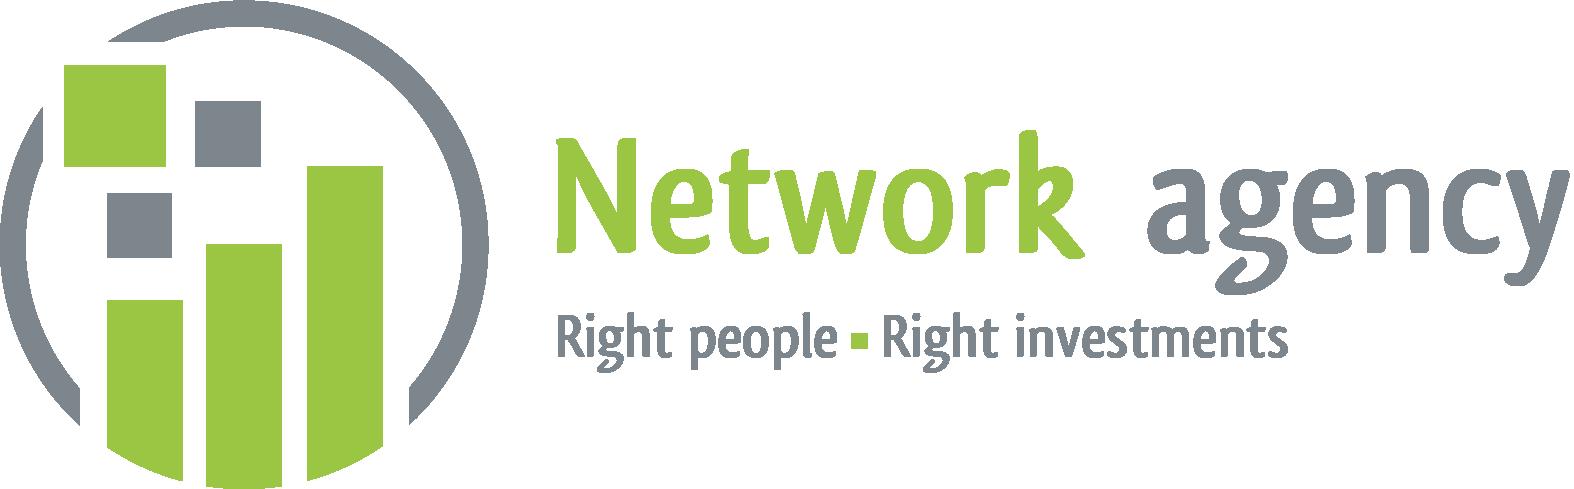 Network Agency Logo